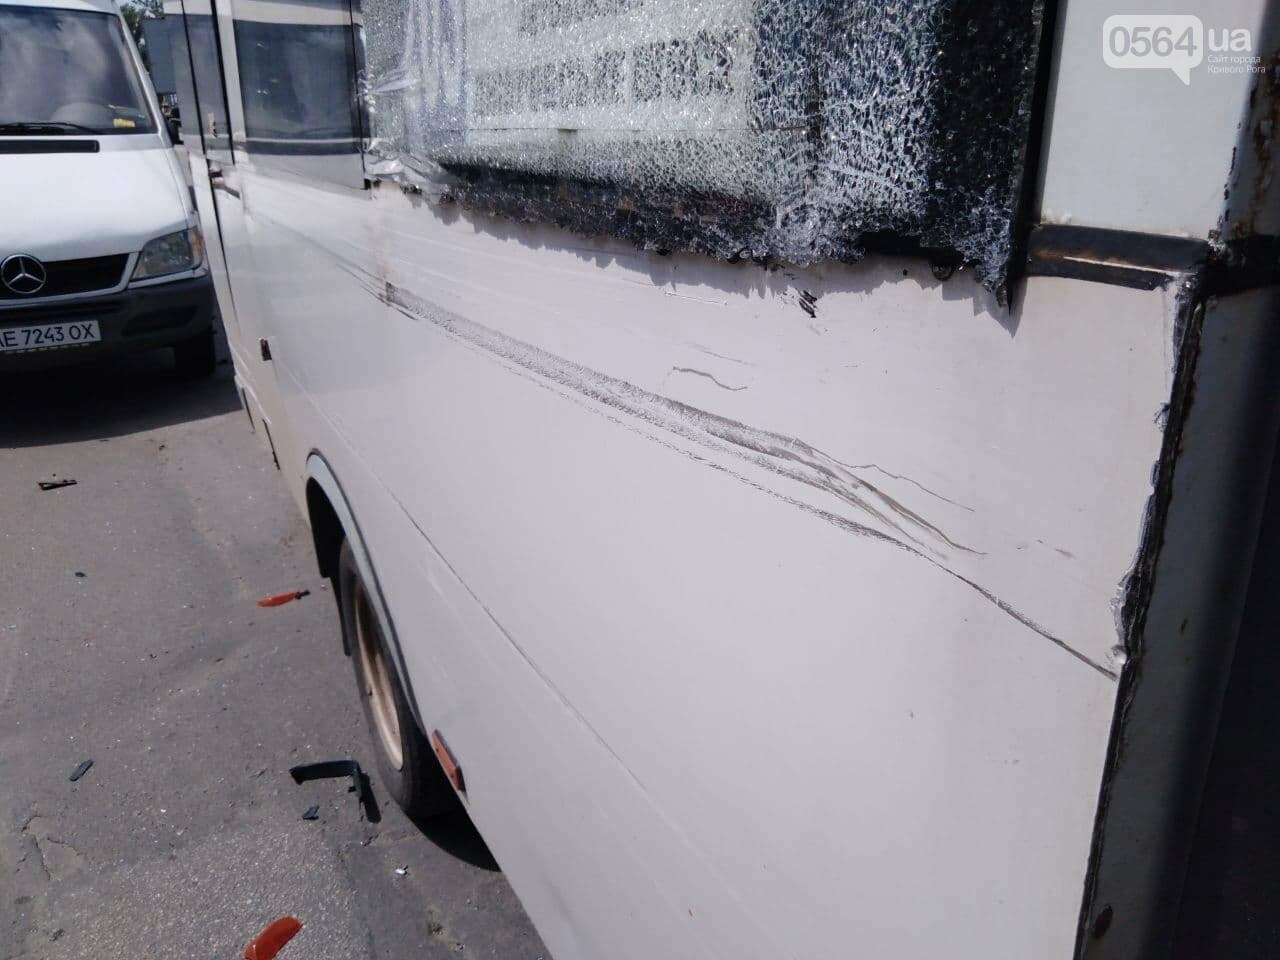 В Кривом Роге столкнулись две маршрутки, - ФОТО, фото-8